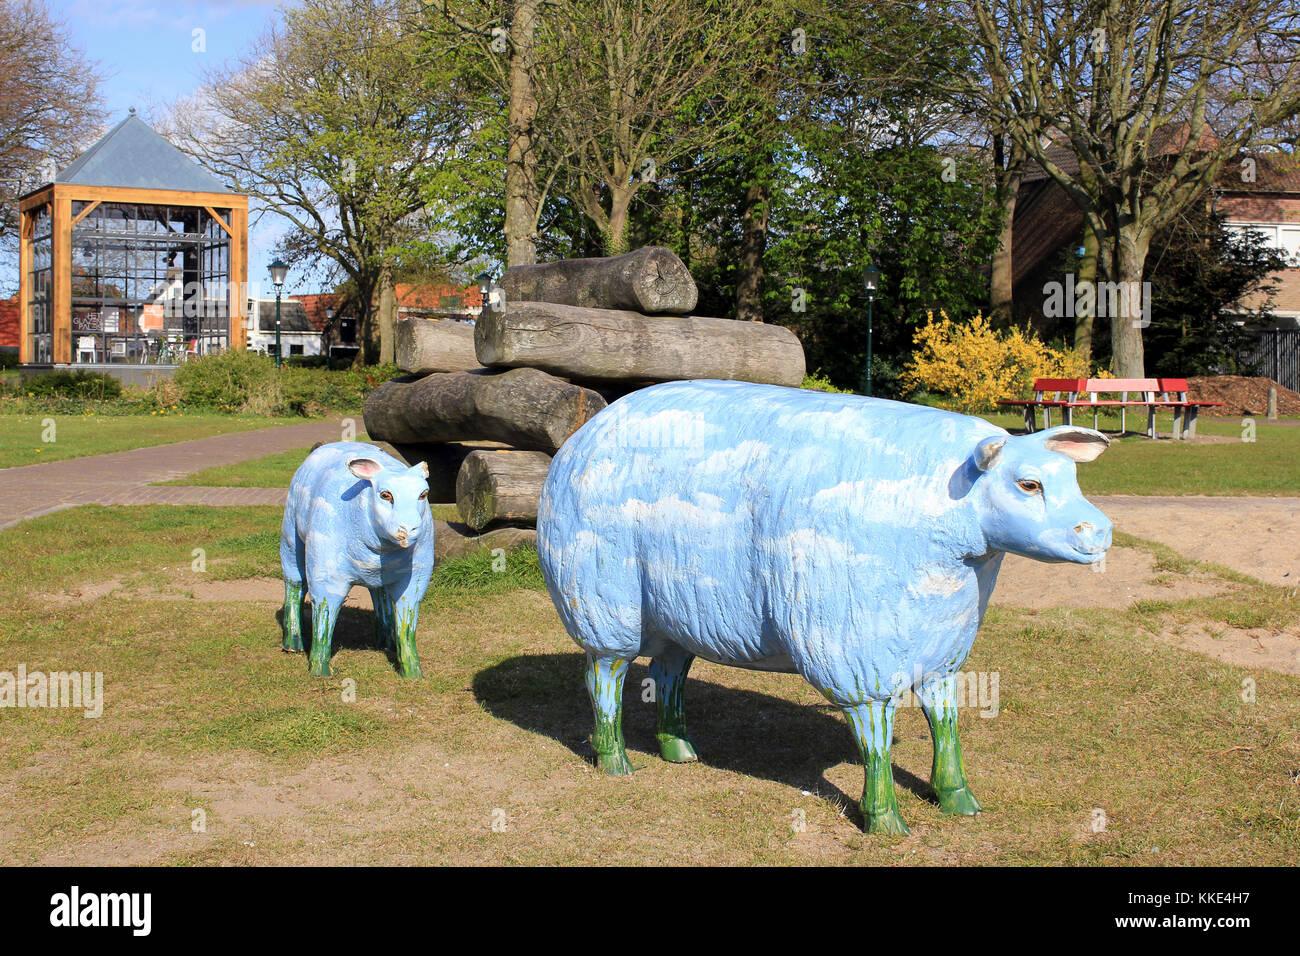 Texel Sheep Artwork in Den Burg, Texel Stock Photo